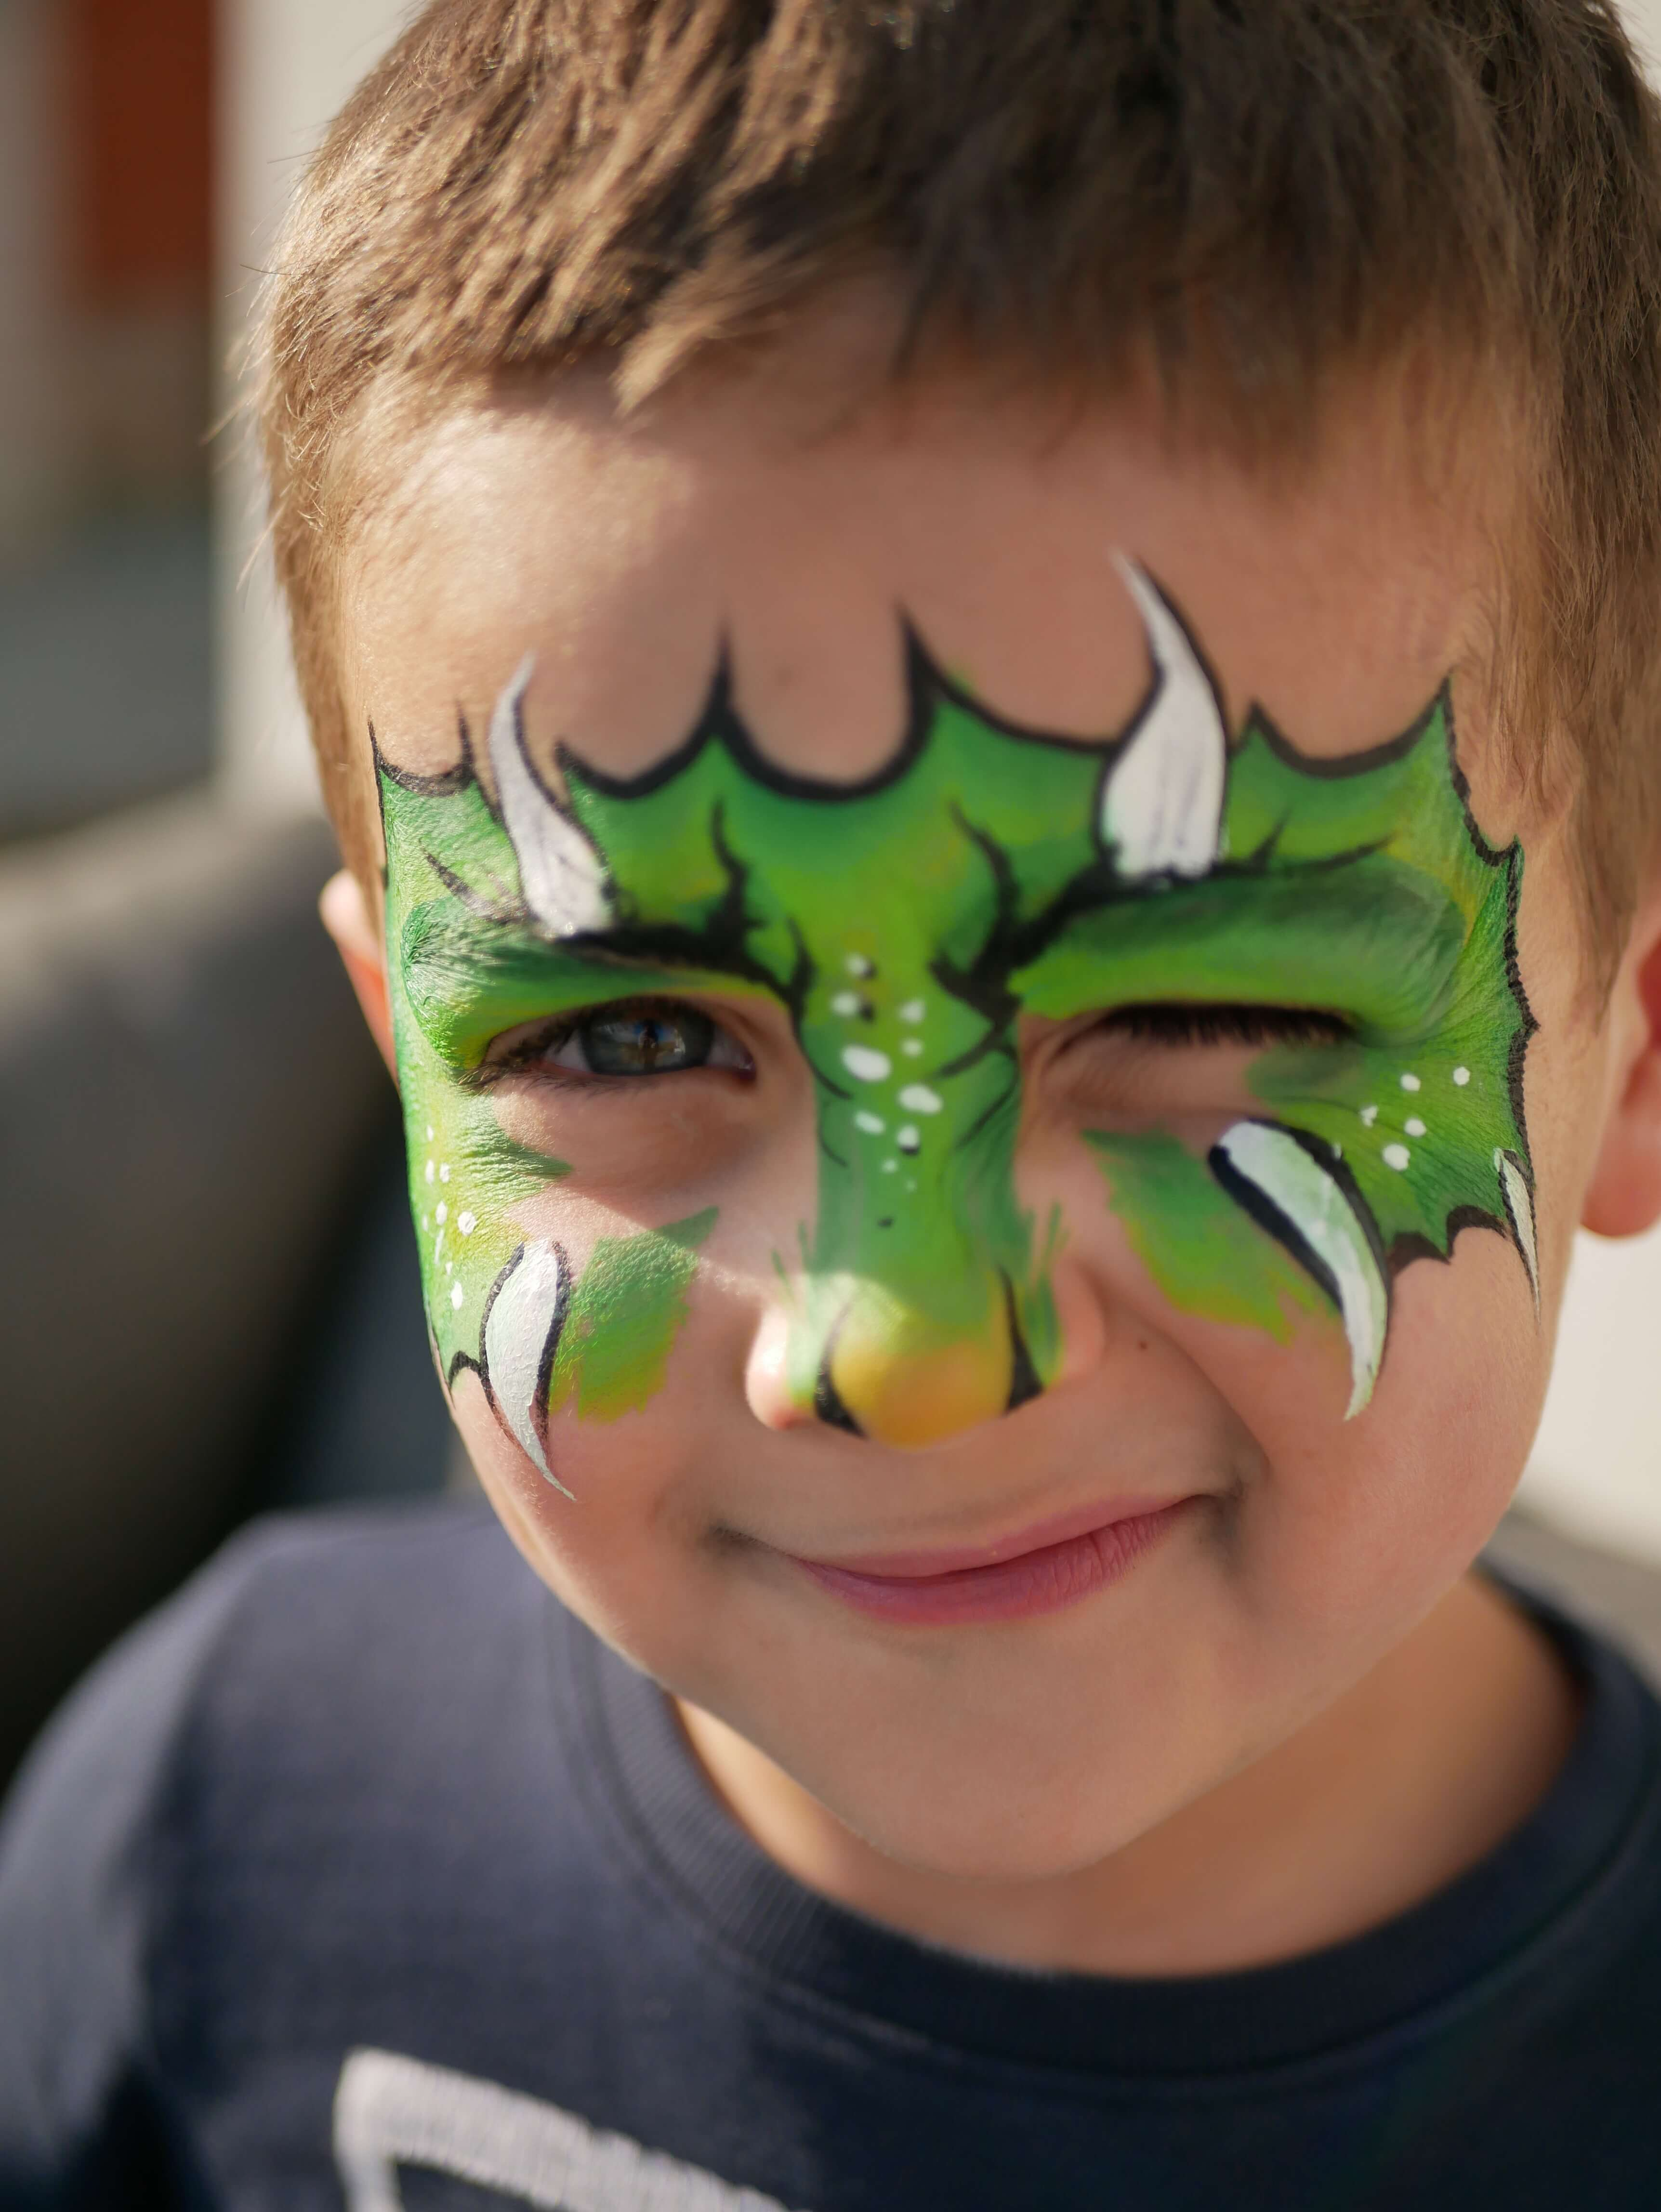 Petit garçon maquillé en Dragon